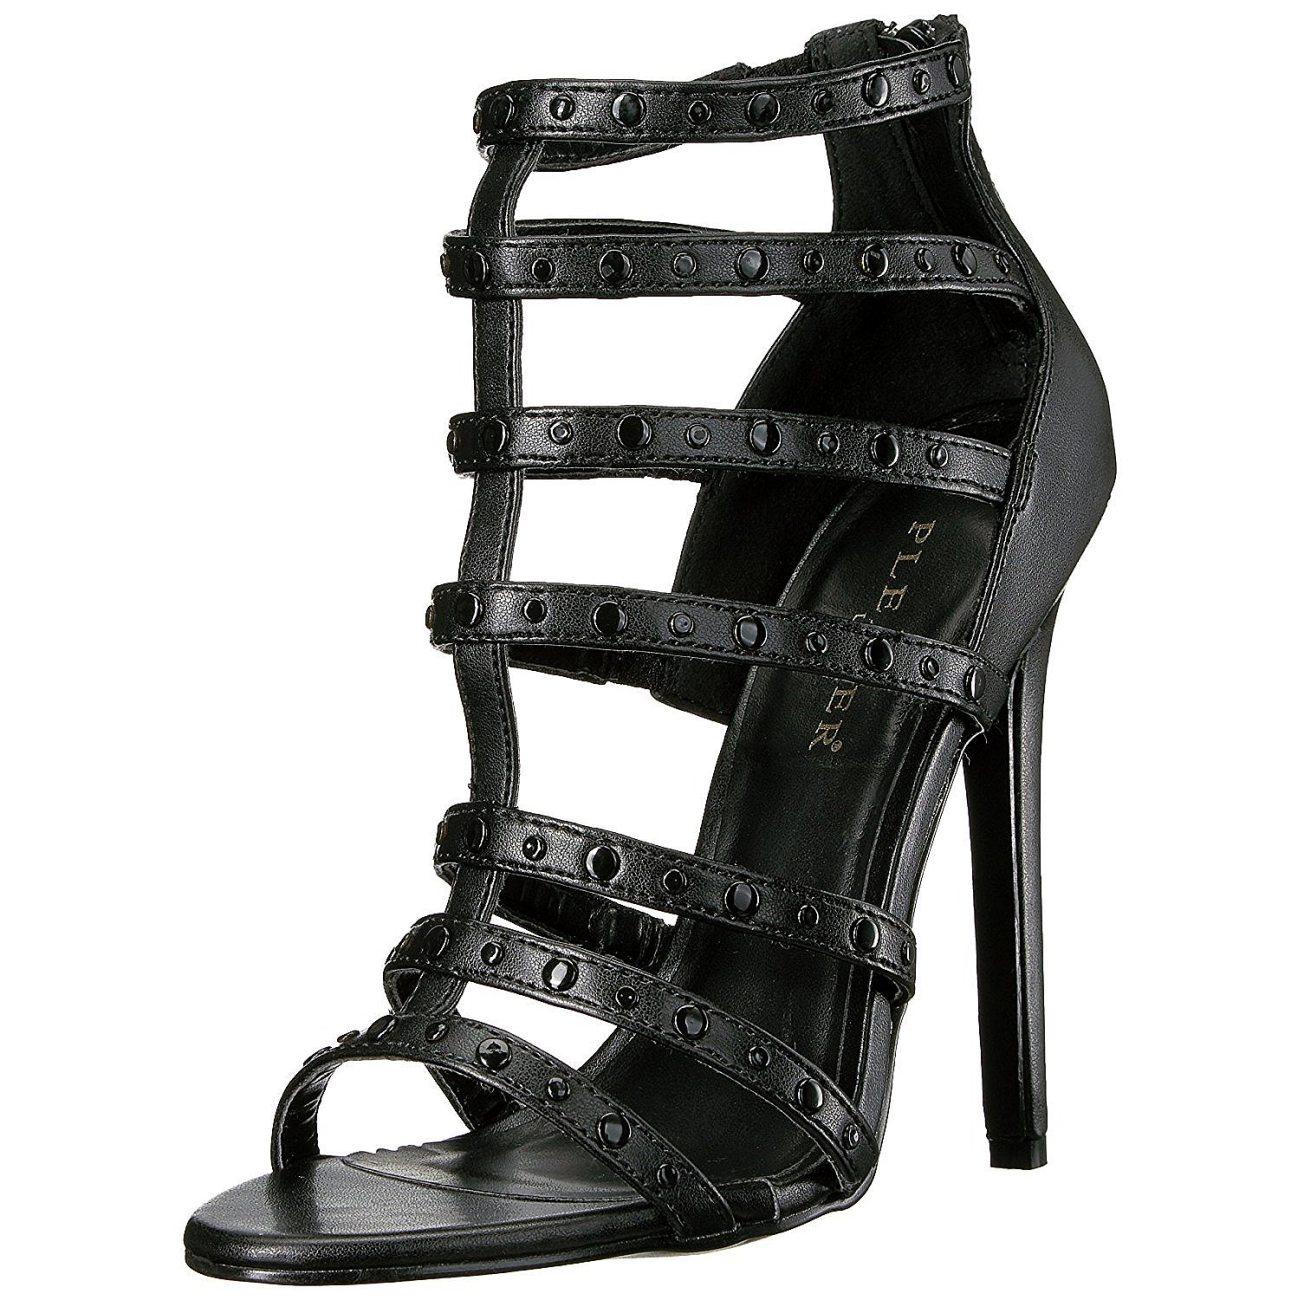 Matto Tacco Con Nero Cm High Sandali 15 13 Heels Sexy I7myb6vfgY